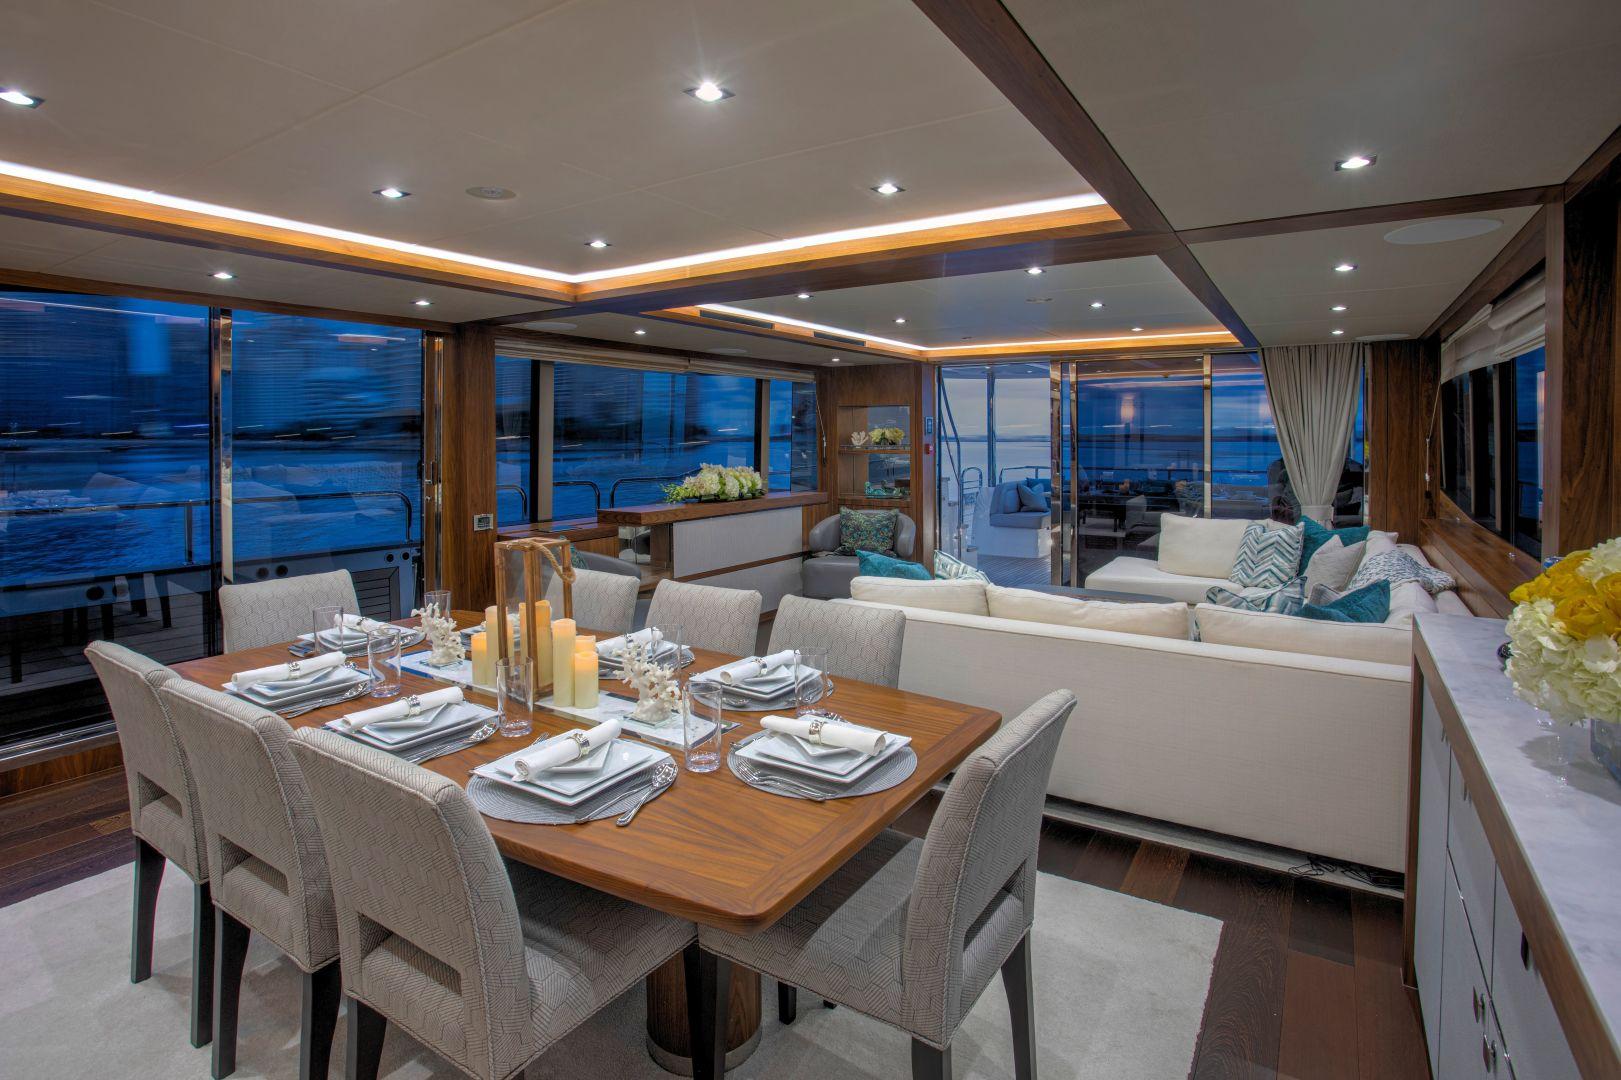 Sunseeker-95 Yacht 2017-Perseverance 3 Ft Lauderdale-Florida-United States-1400079   Thumbnail